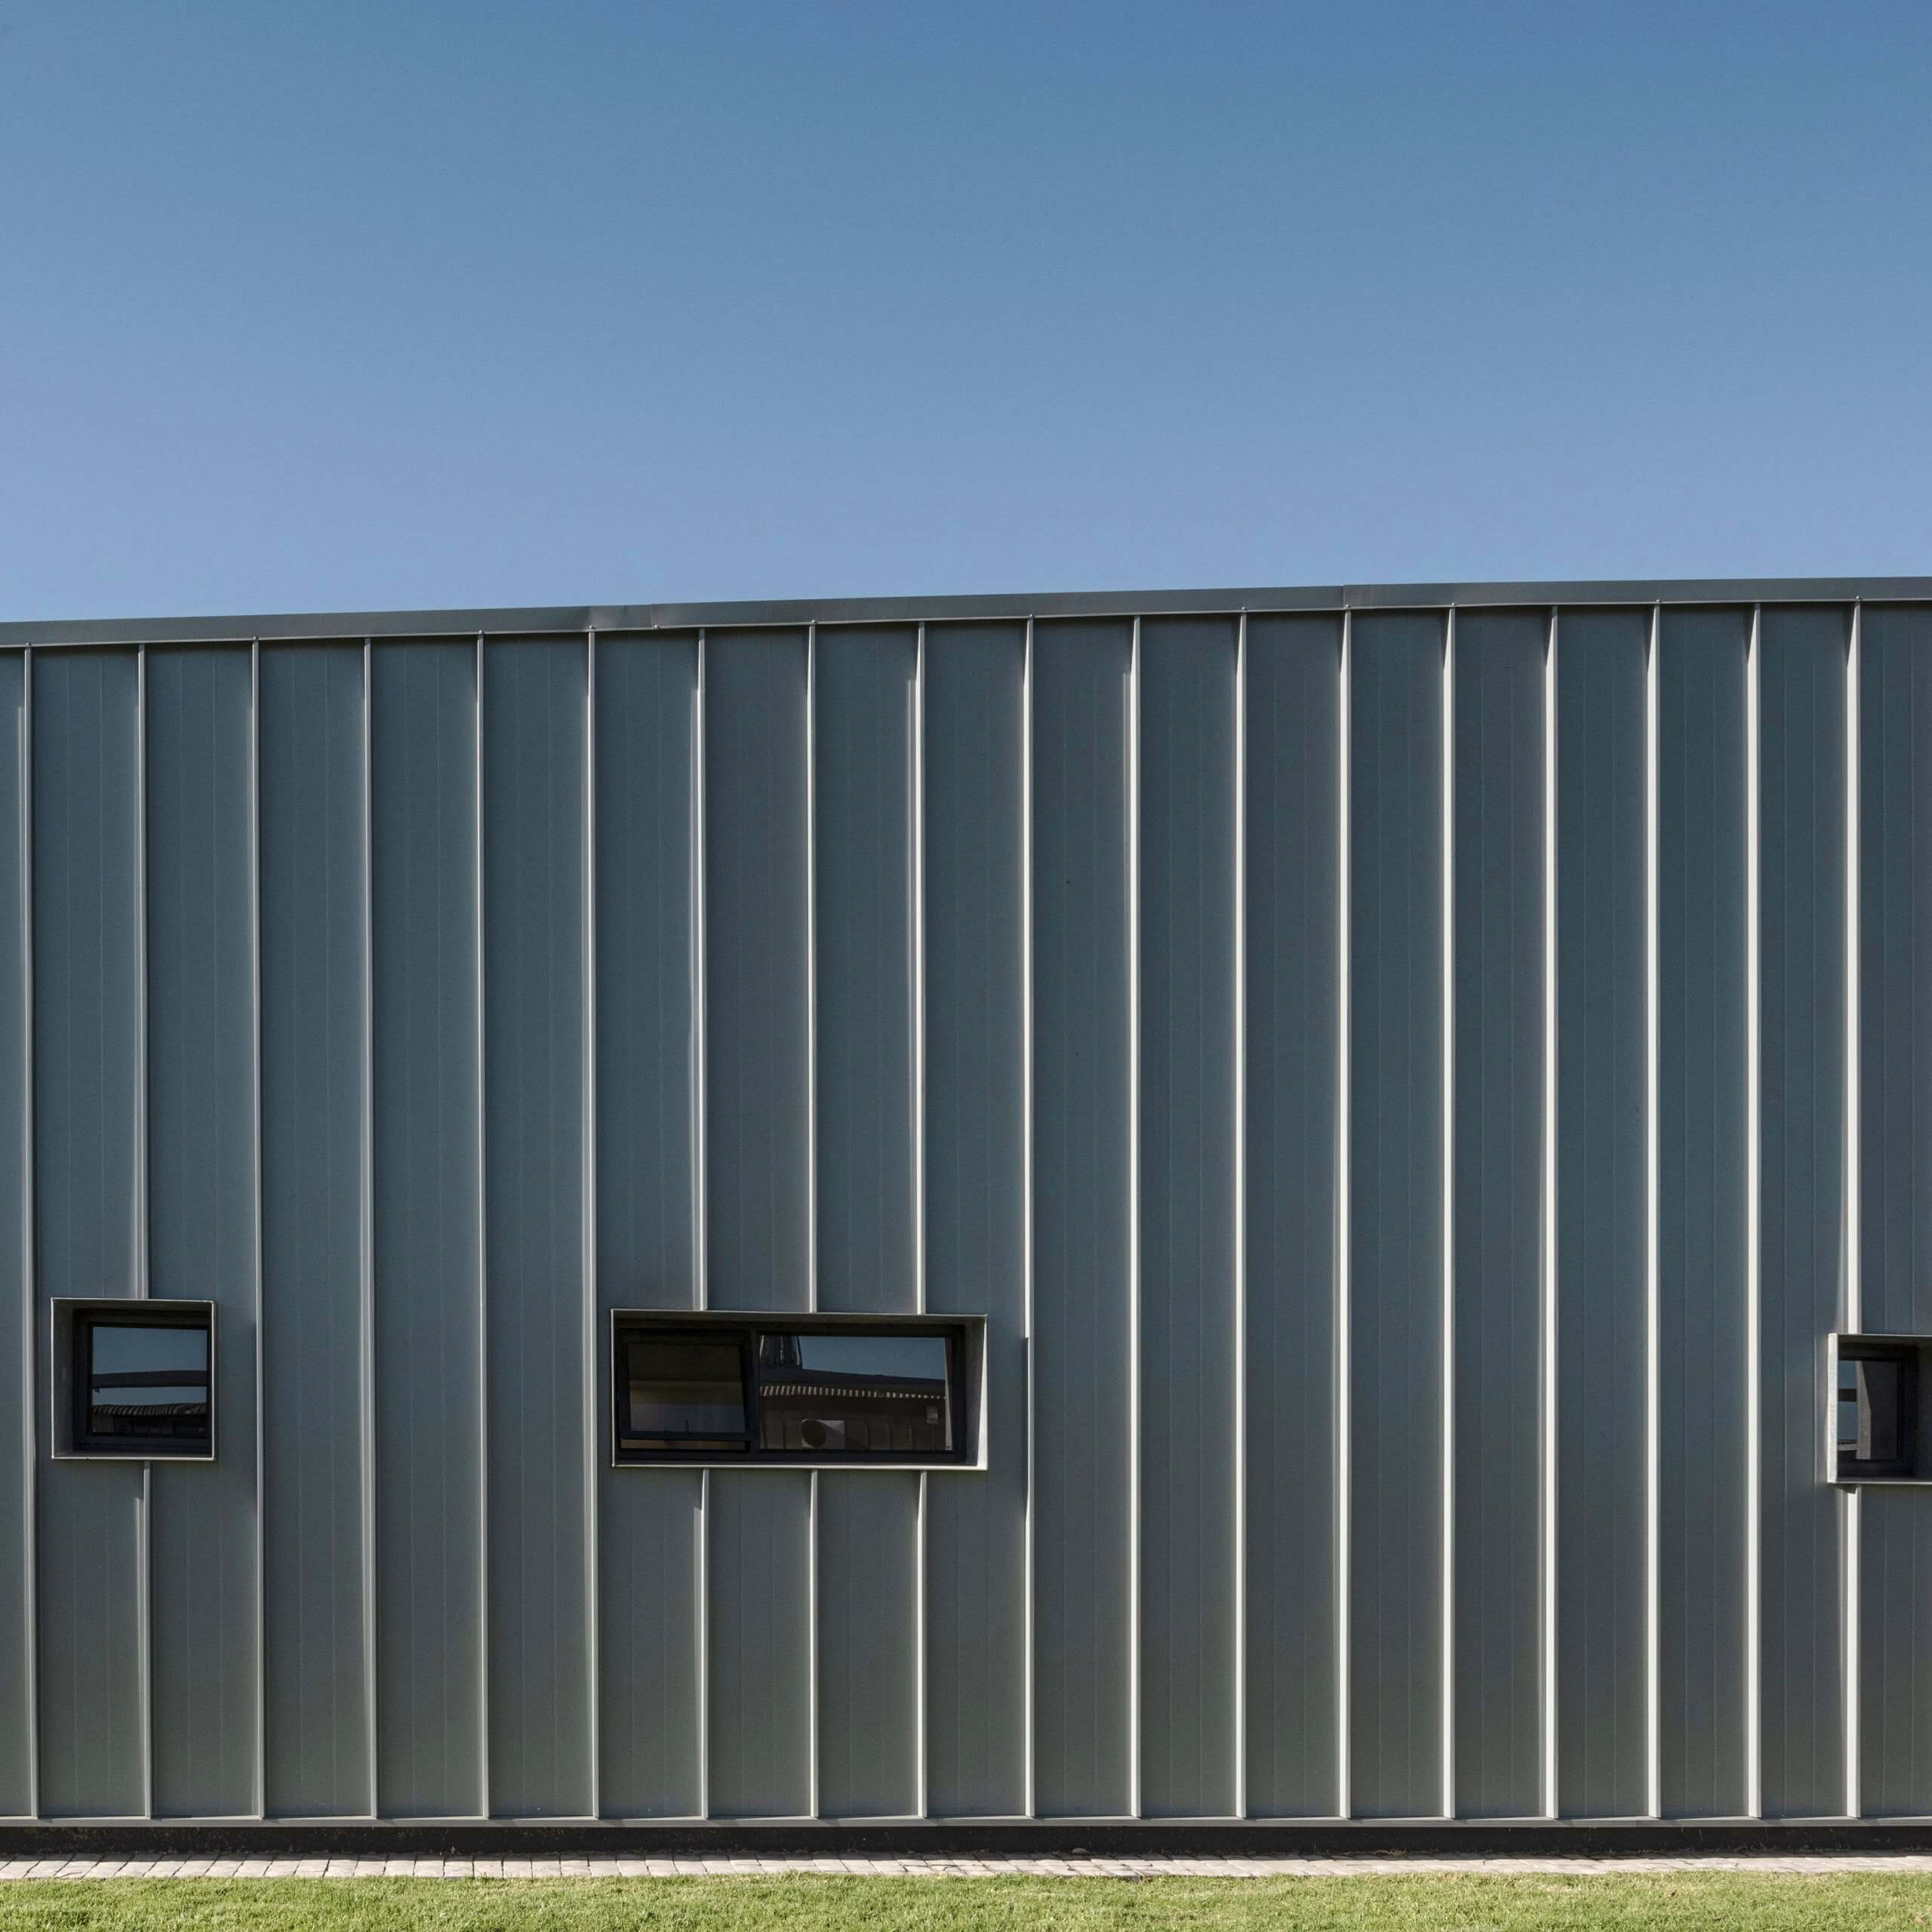 RFG Lab & New Product Development Facility